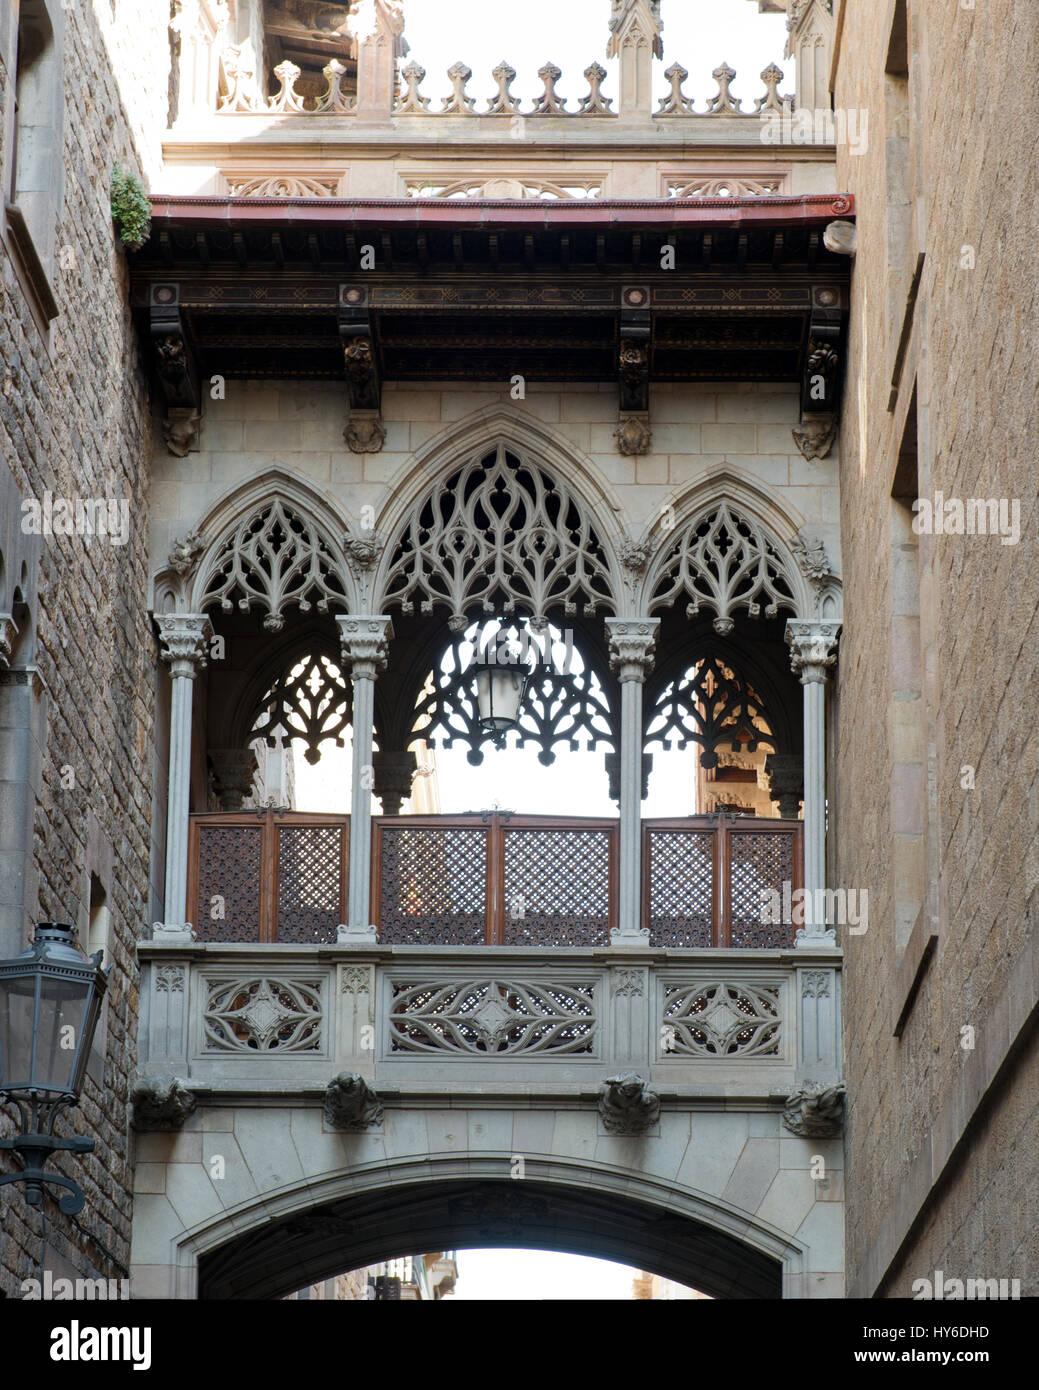 Seufzerbrücke zwischen Casa dels Canonges und Palau de Generalitat, Barri Gòtic, Barcelona, Katalonien, - Stock Image